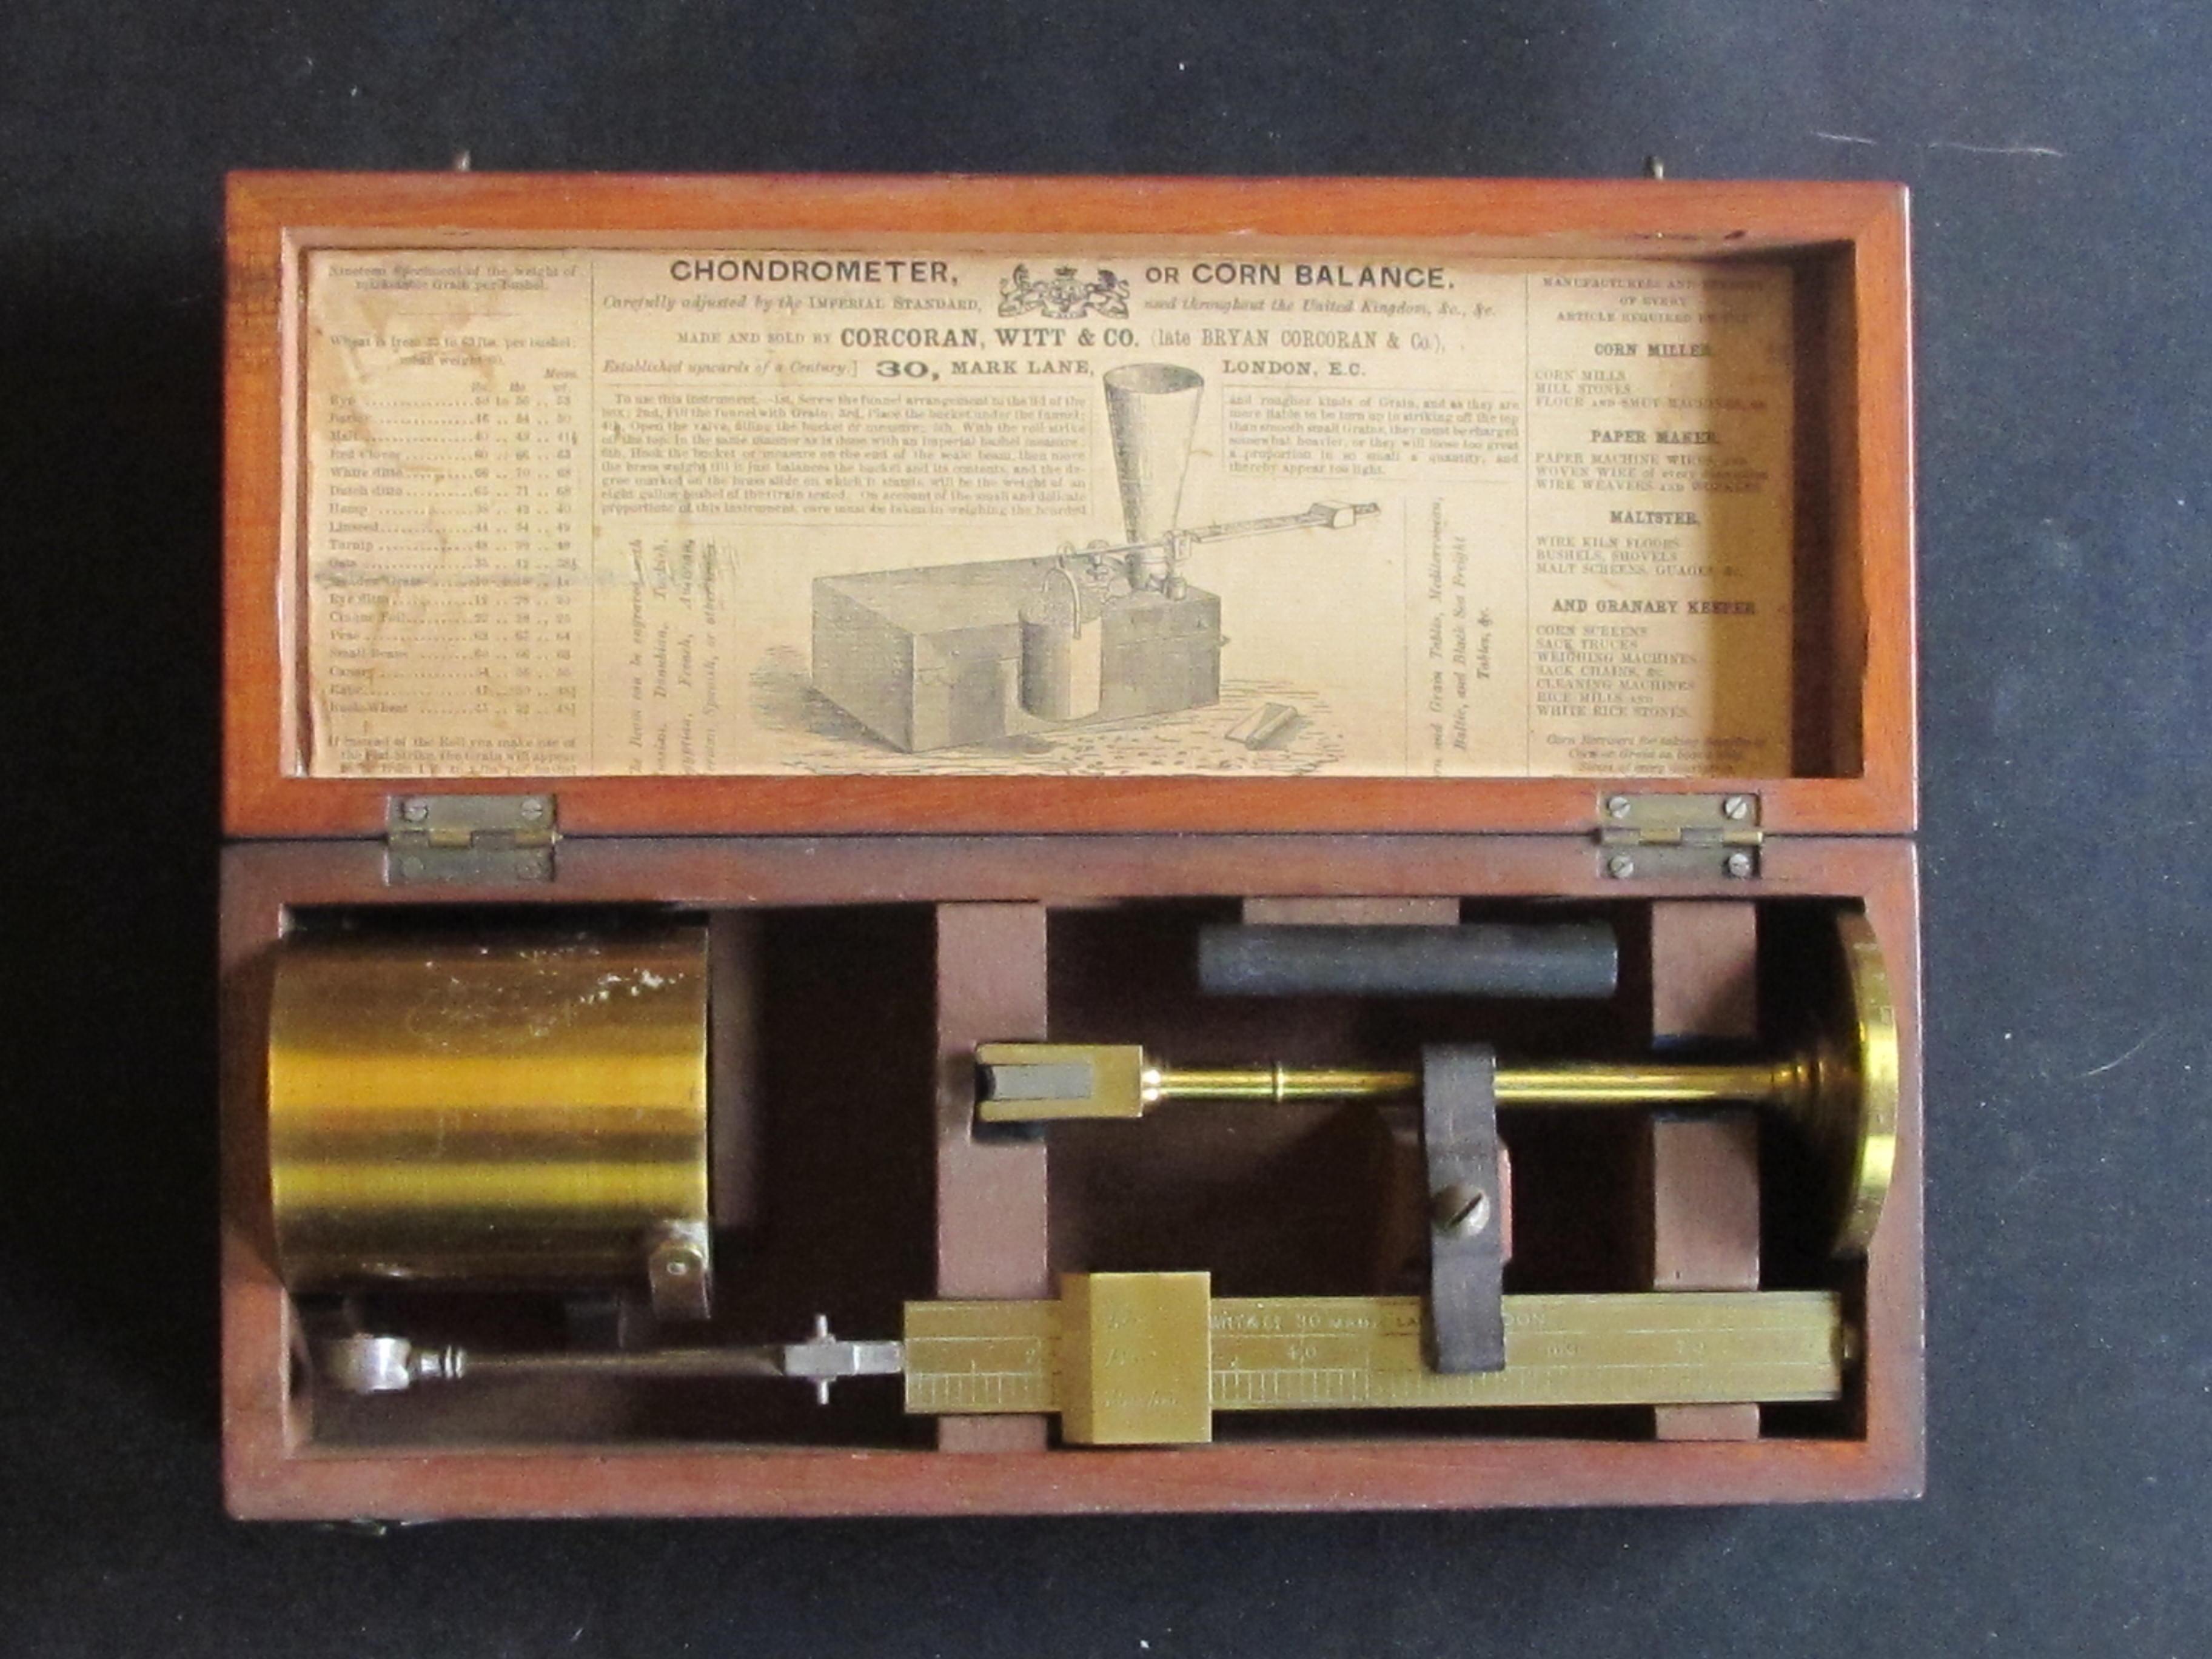 A Good Chondrometer by Corcoran, Witt & Co. 30, Mark Lane London